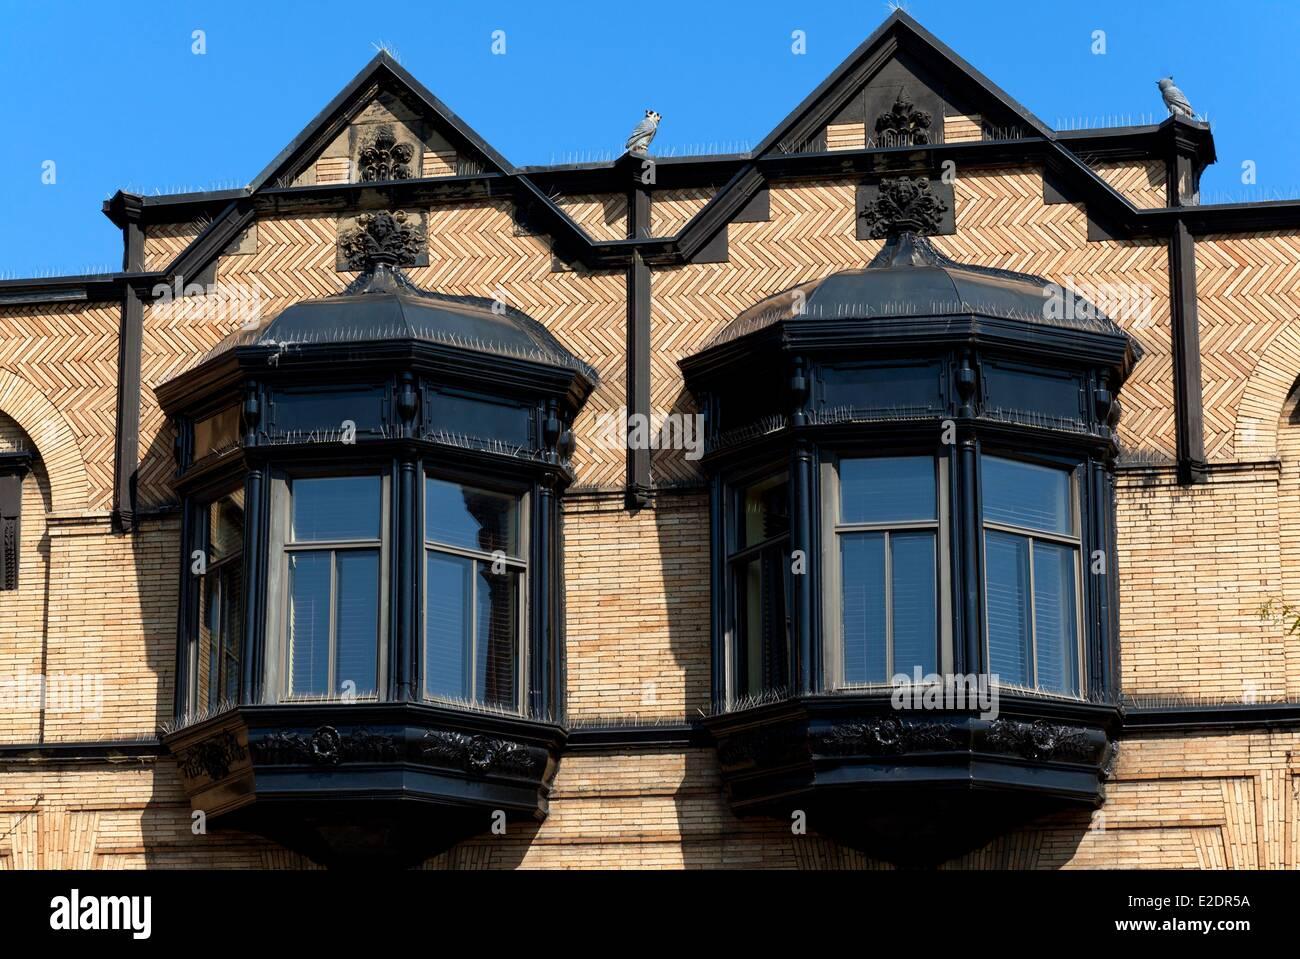 Montreal Quebec Province Canadá Plateau Mont-Royal fachada original de una antigua casa bow windows Imagen De Stock